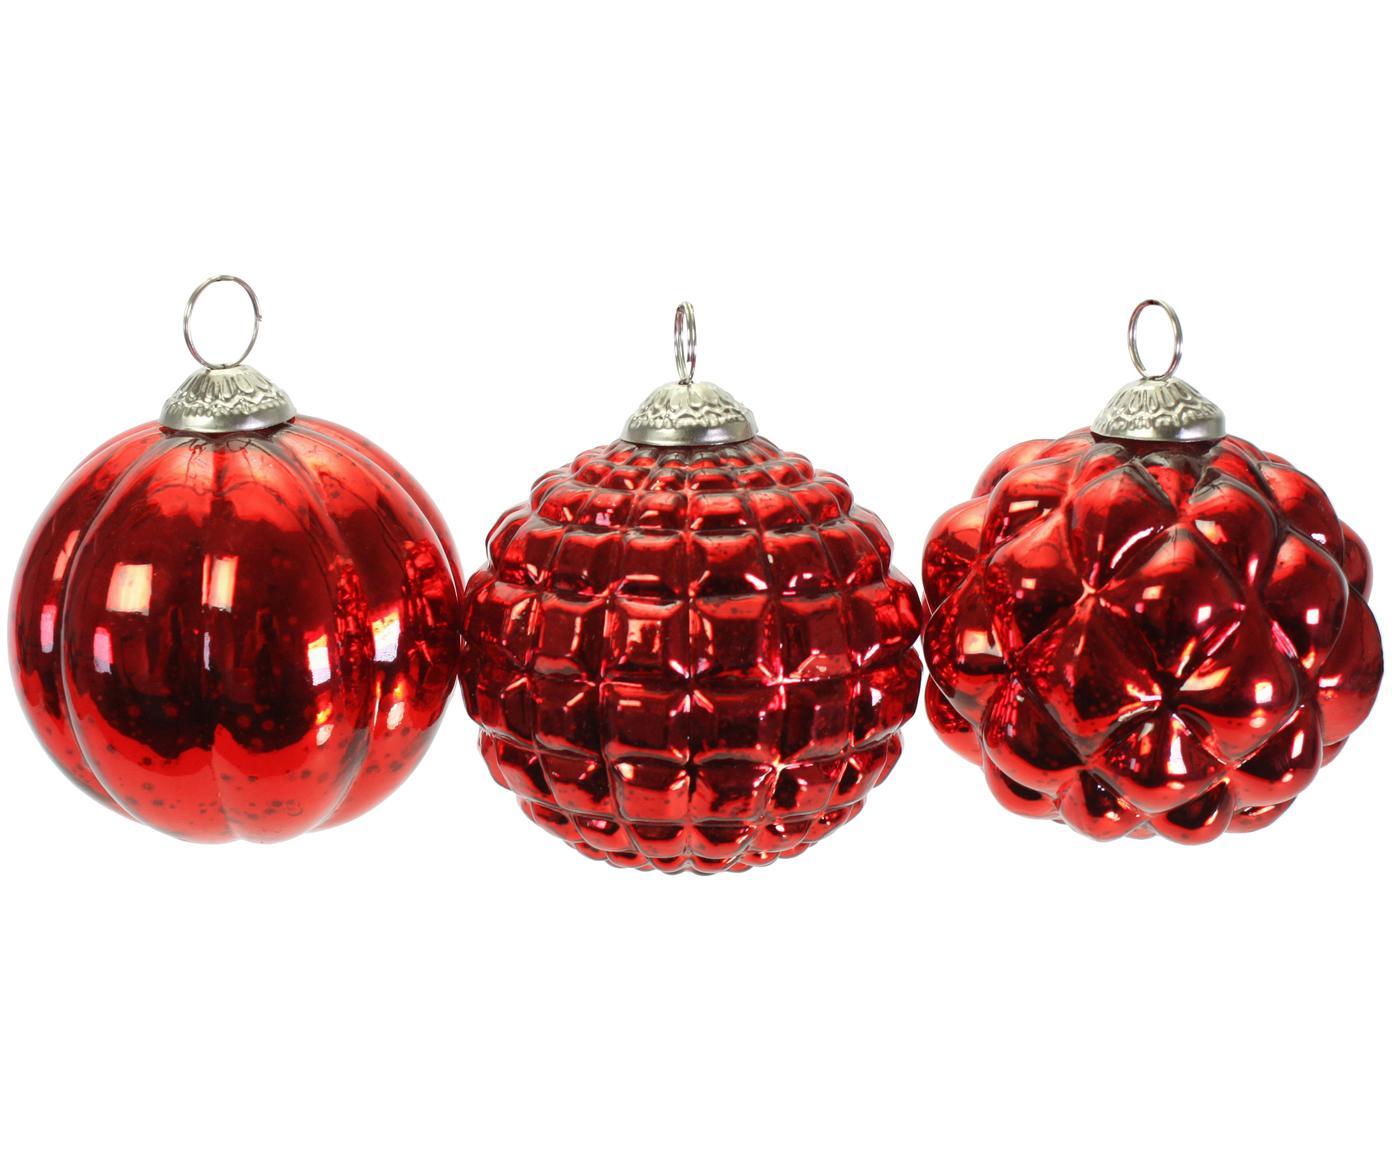 Weihnachtskugel-Set Red Variety Ø10cm, 3-tlg., Glas, lackiert, Rot, Ø 10 cm